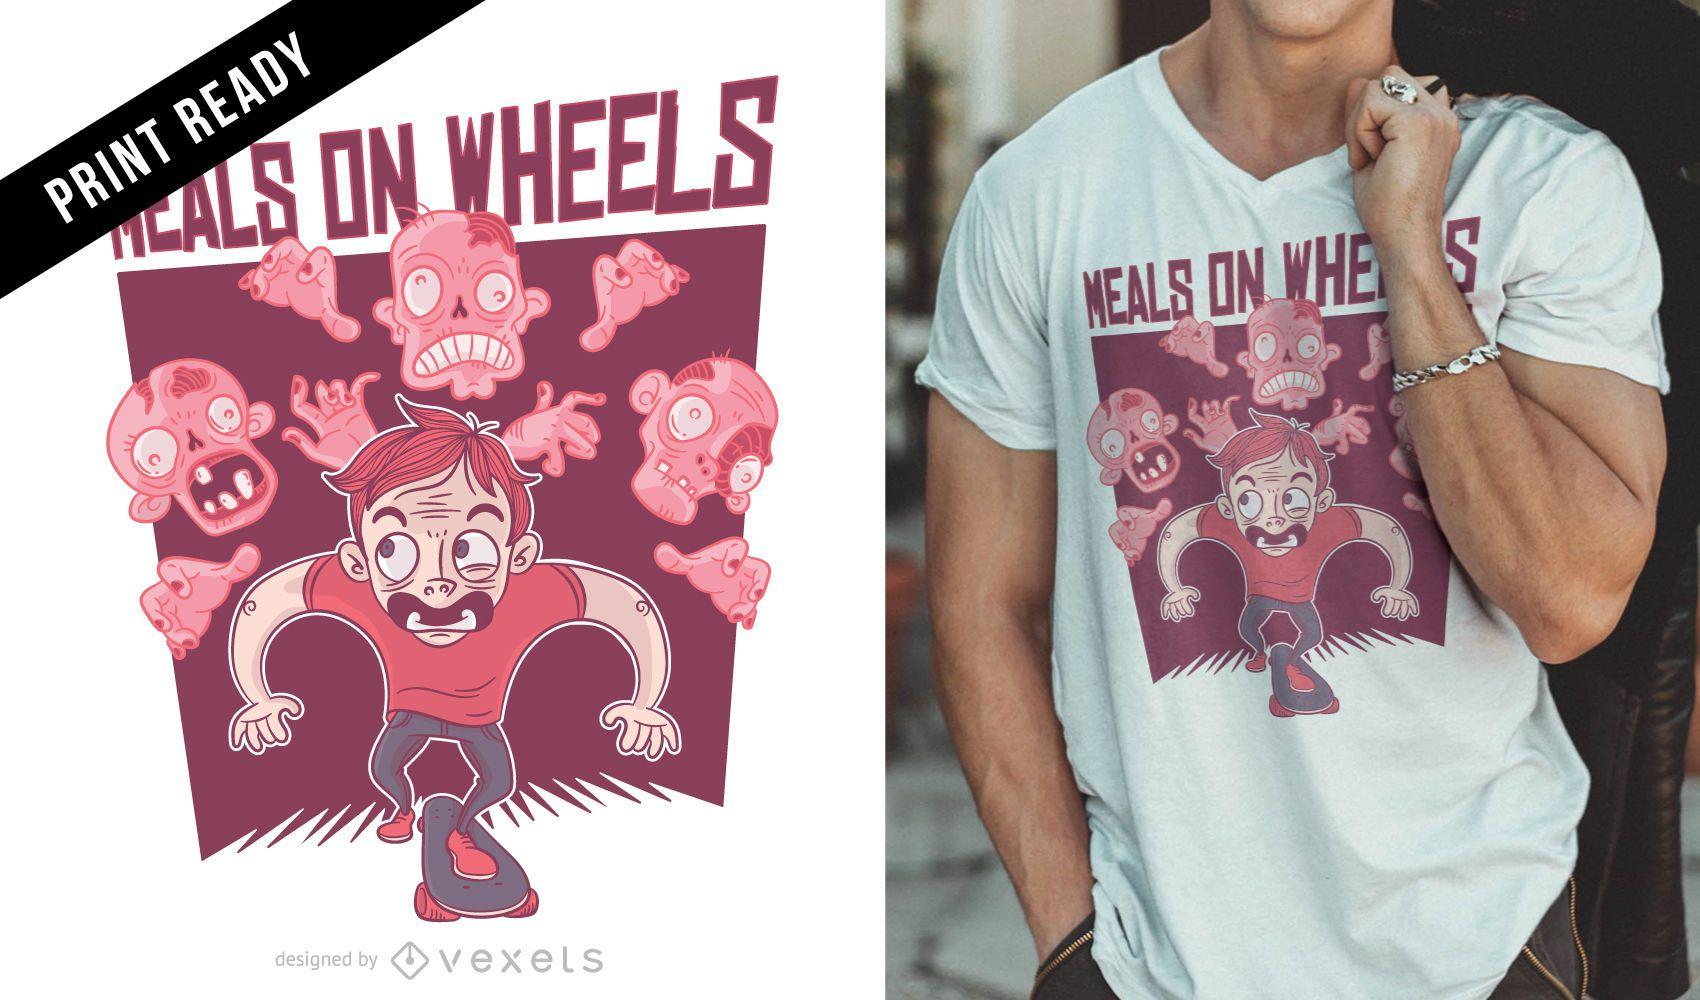 Meals on wheels t-shirt design